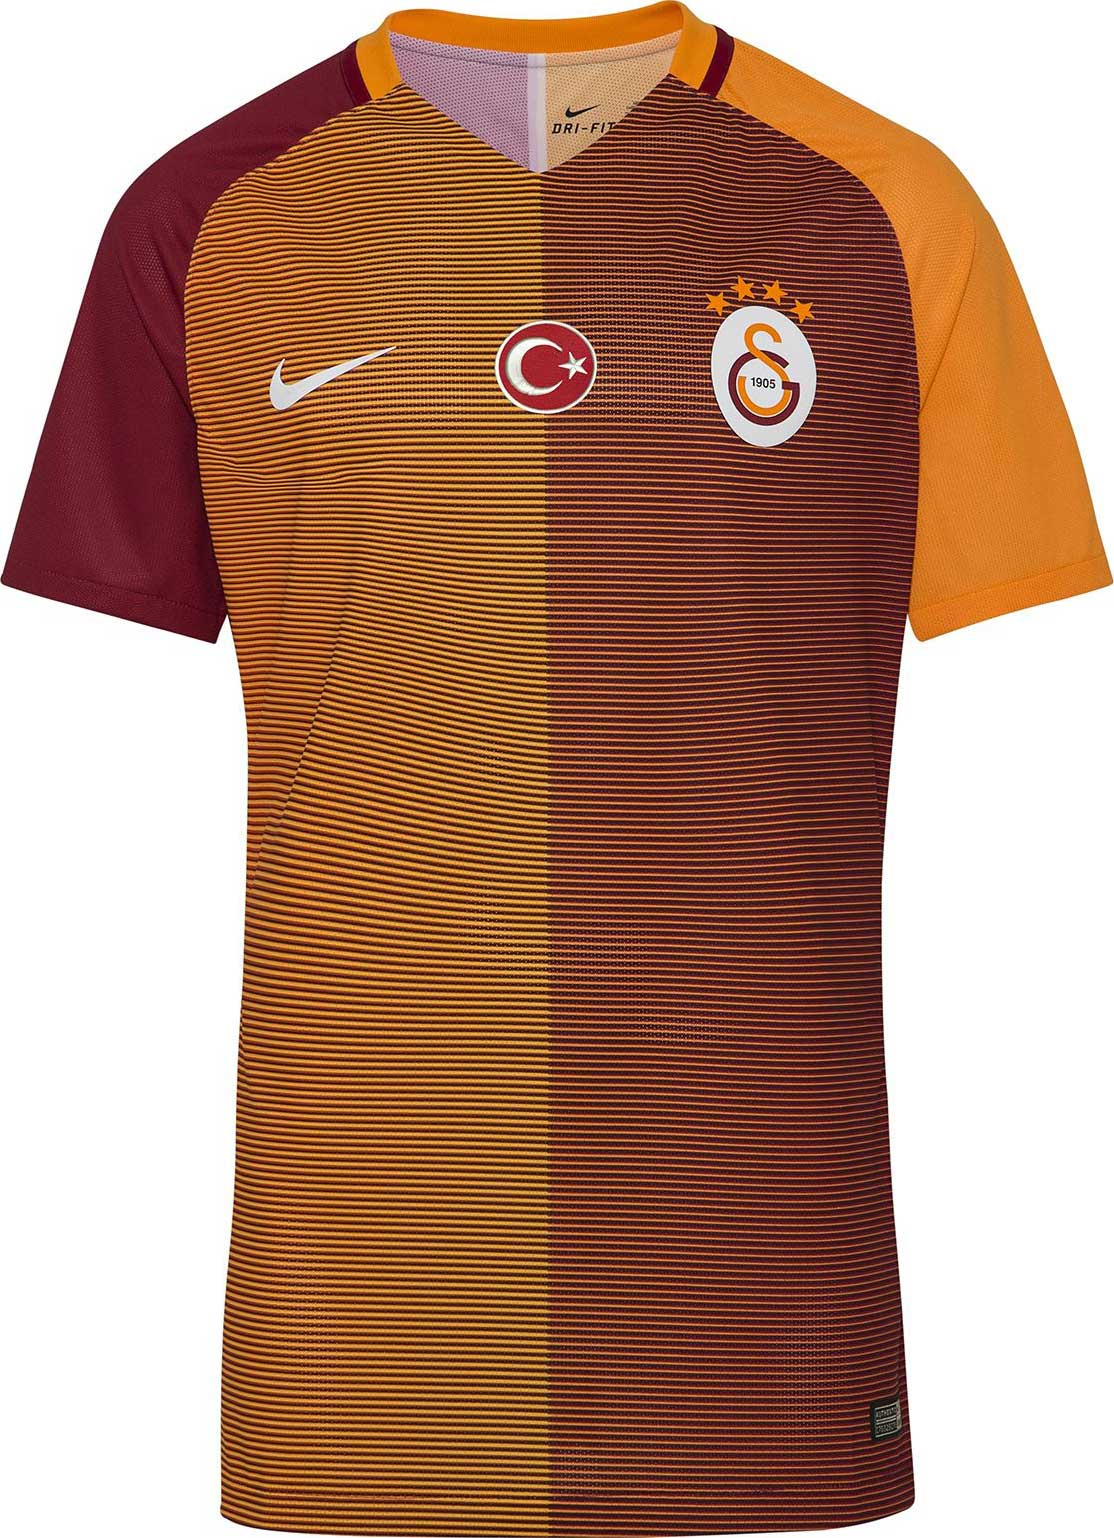 hot sale online 4ea79 f65cb Galatasaray 2016-17 Kits Revealed